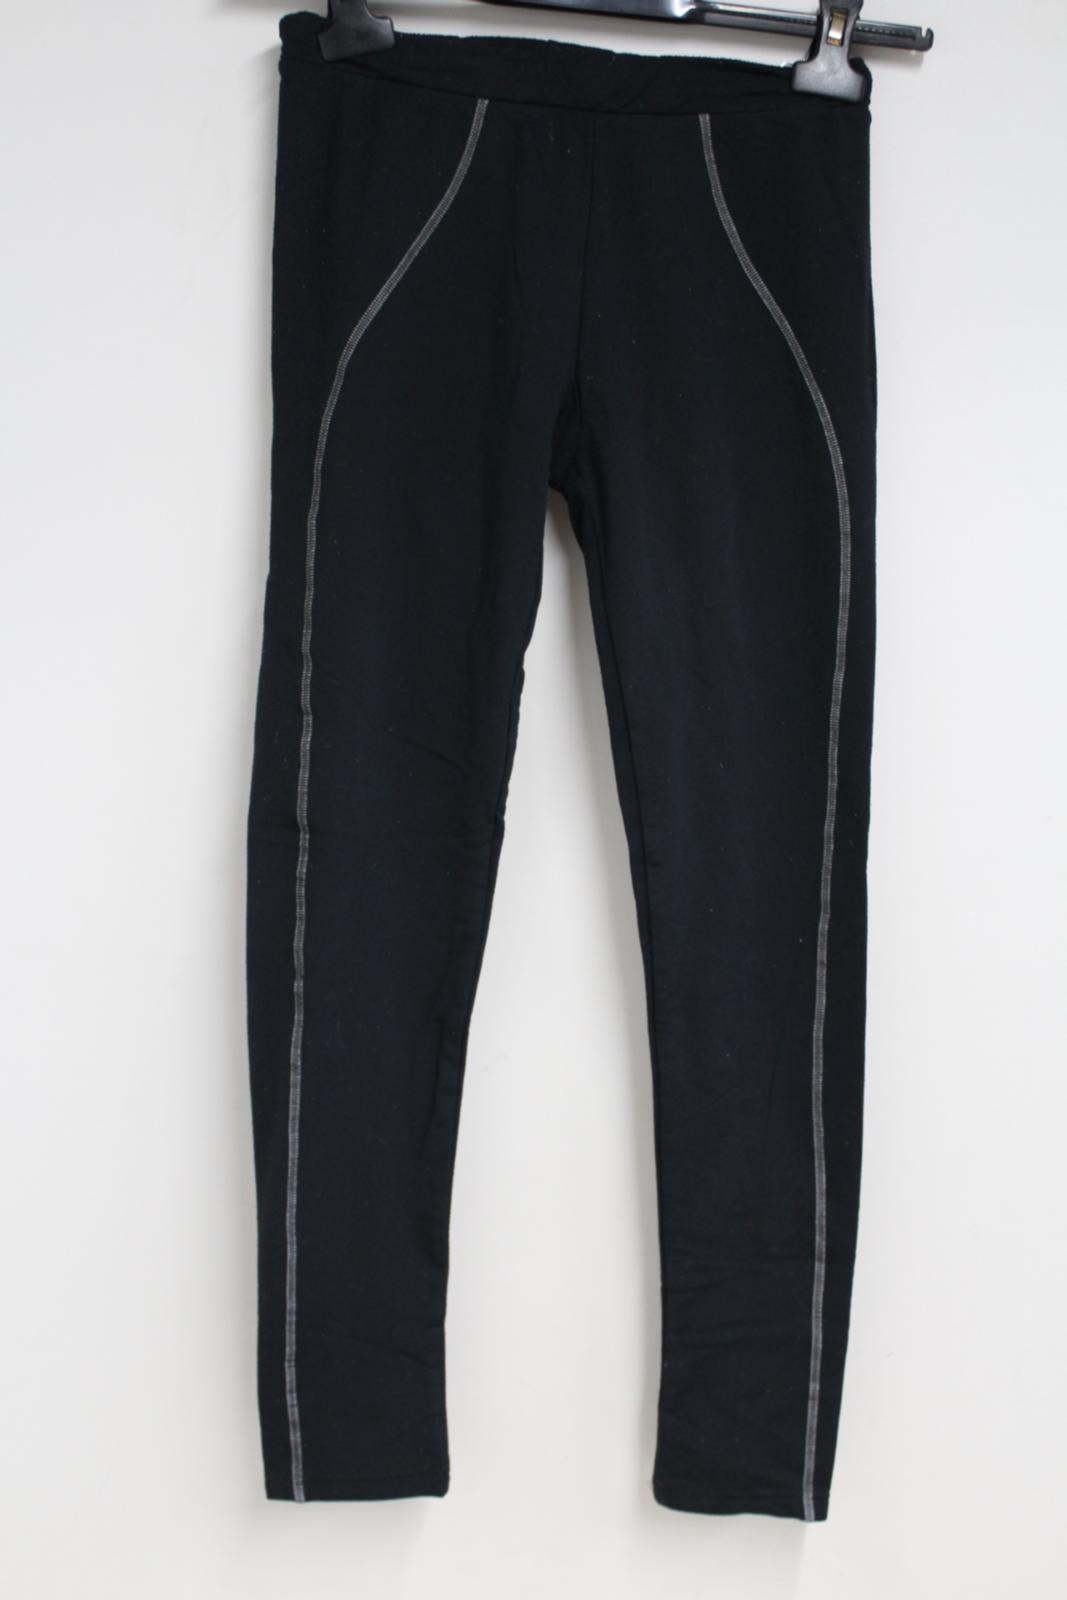 Sweaty-Betty-Ladies-Negro-Chandal-Activewear-Fitness-Leggings-Talla-S-W24-L26 miniatura 2